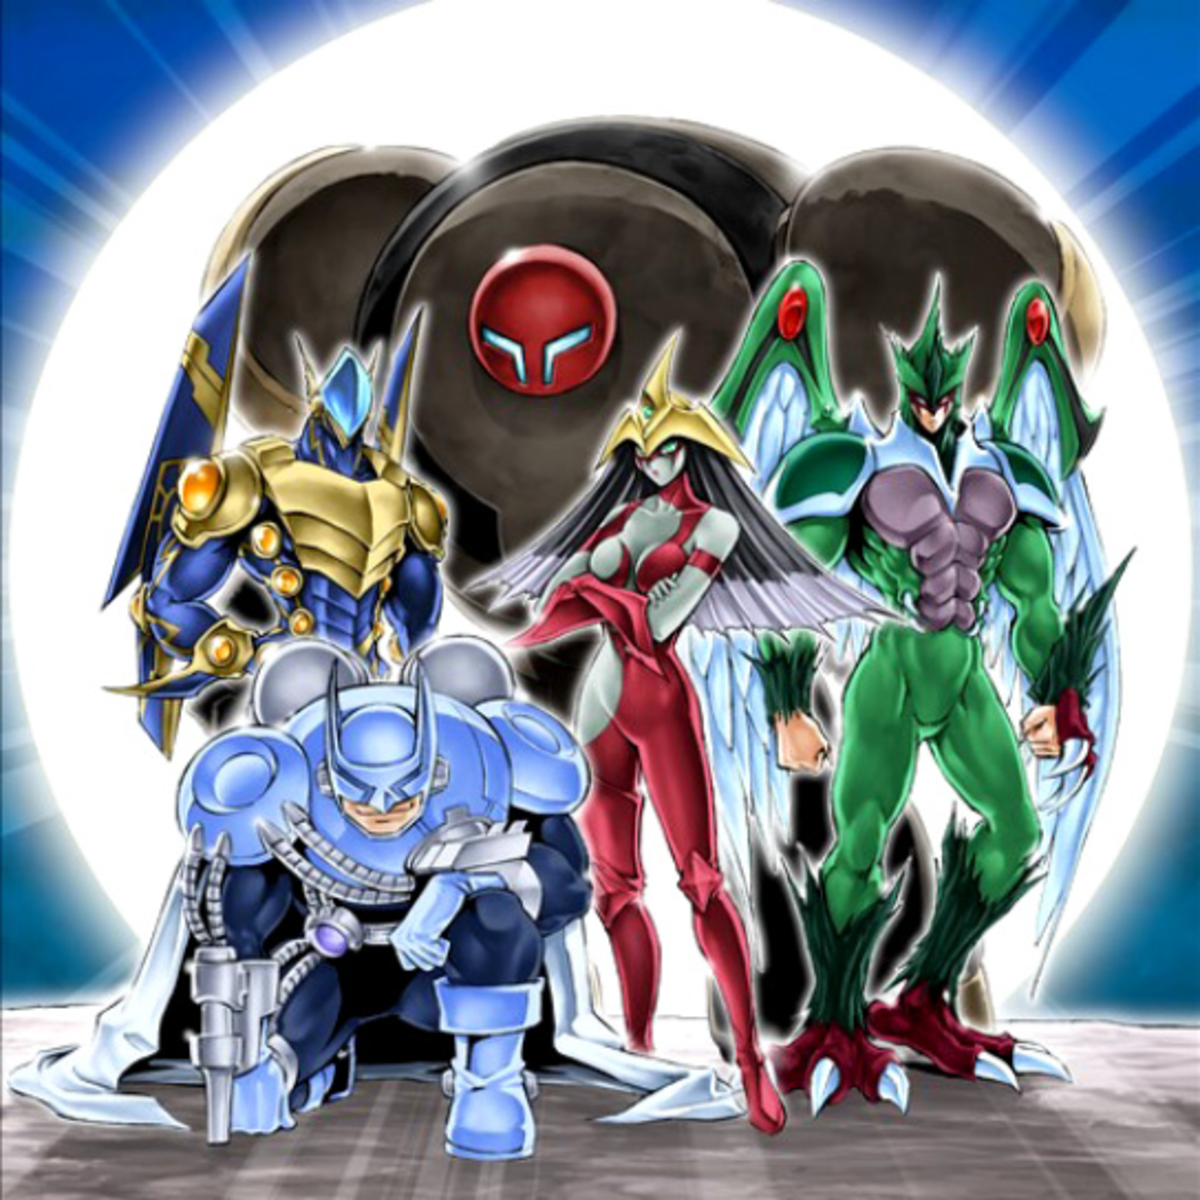 Elemental HERO members